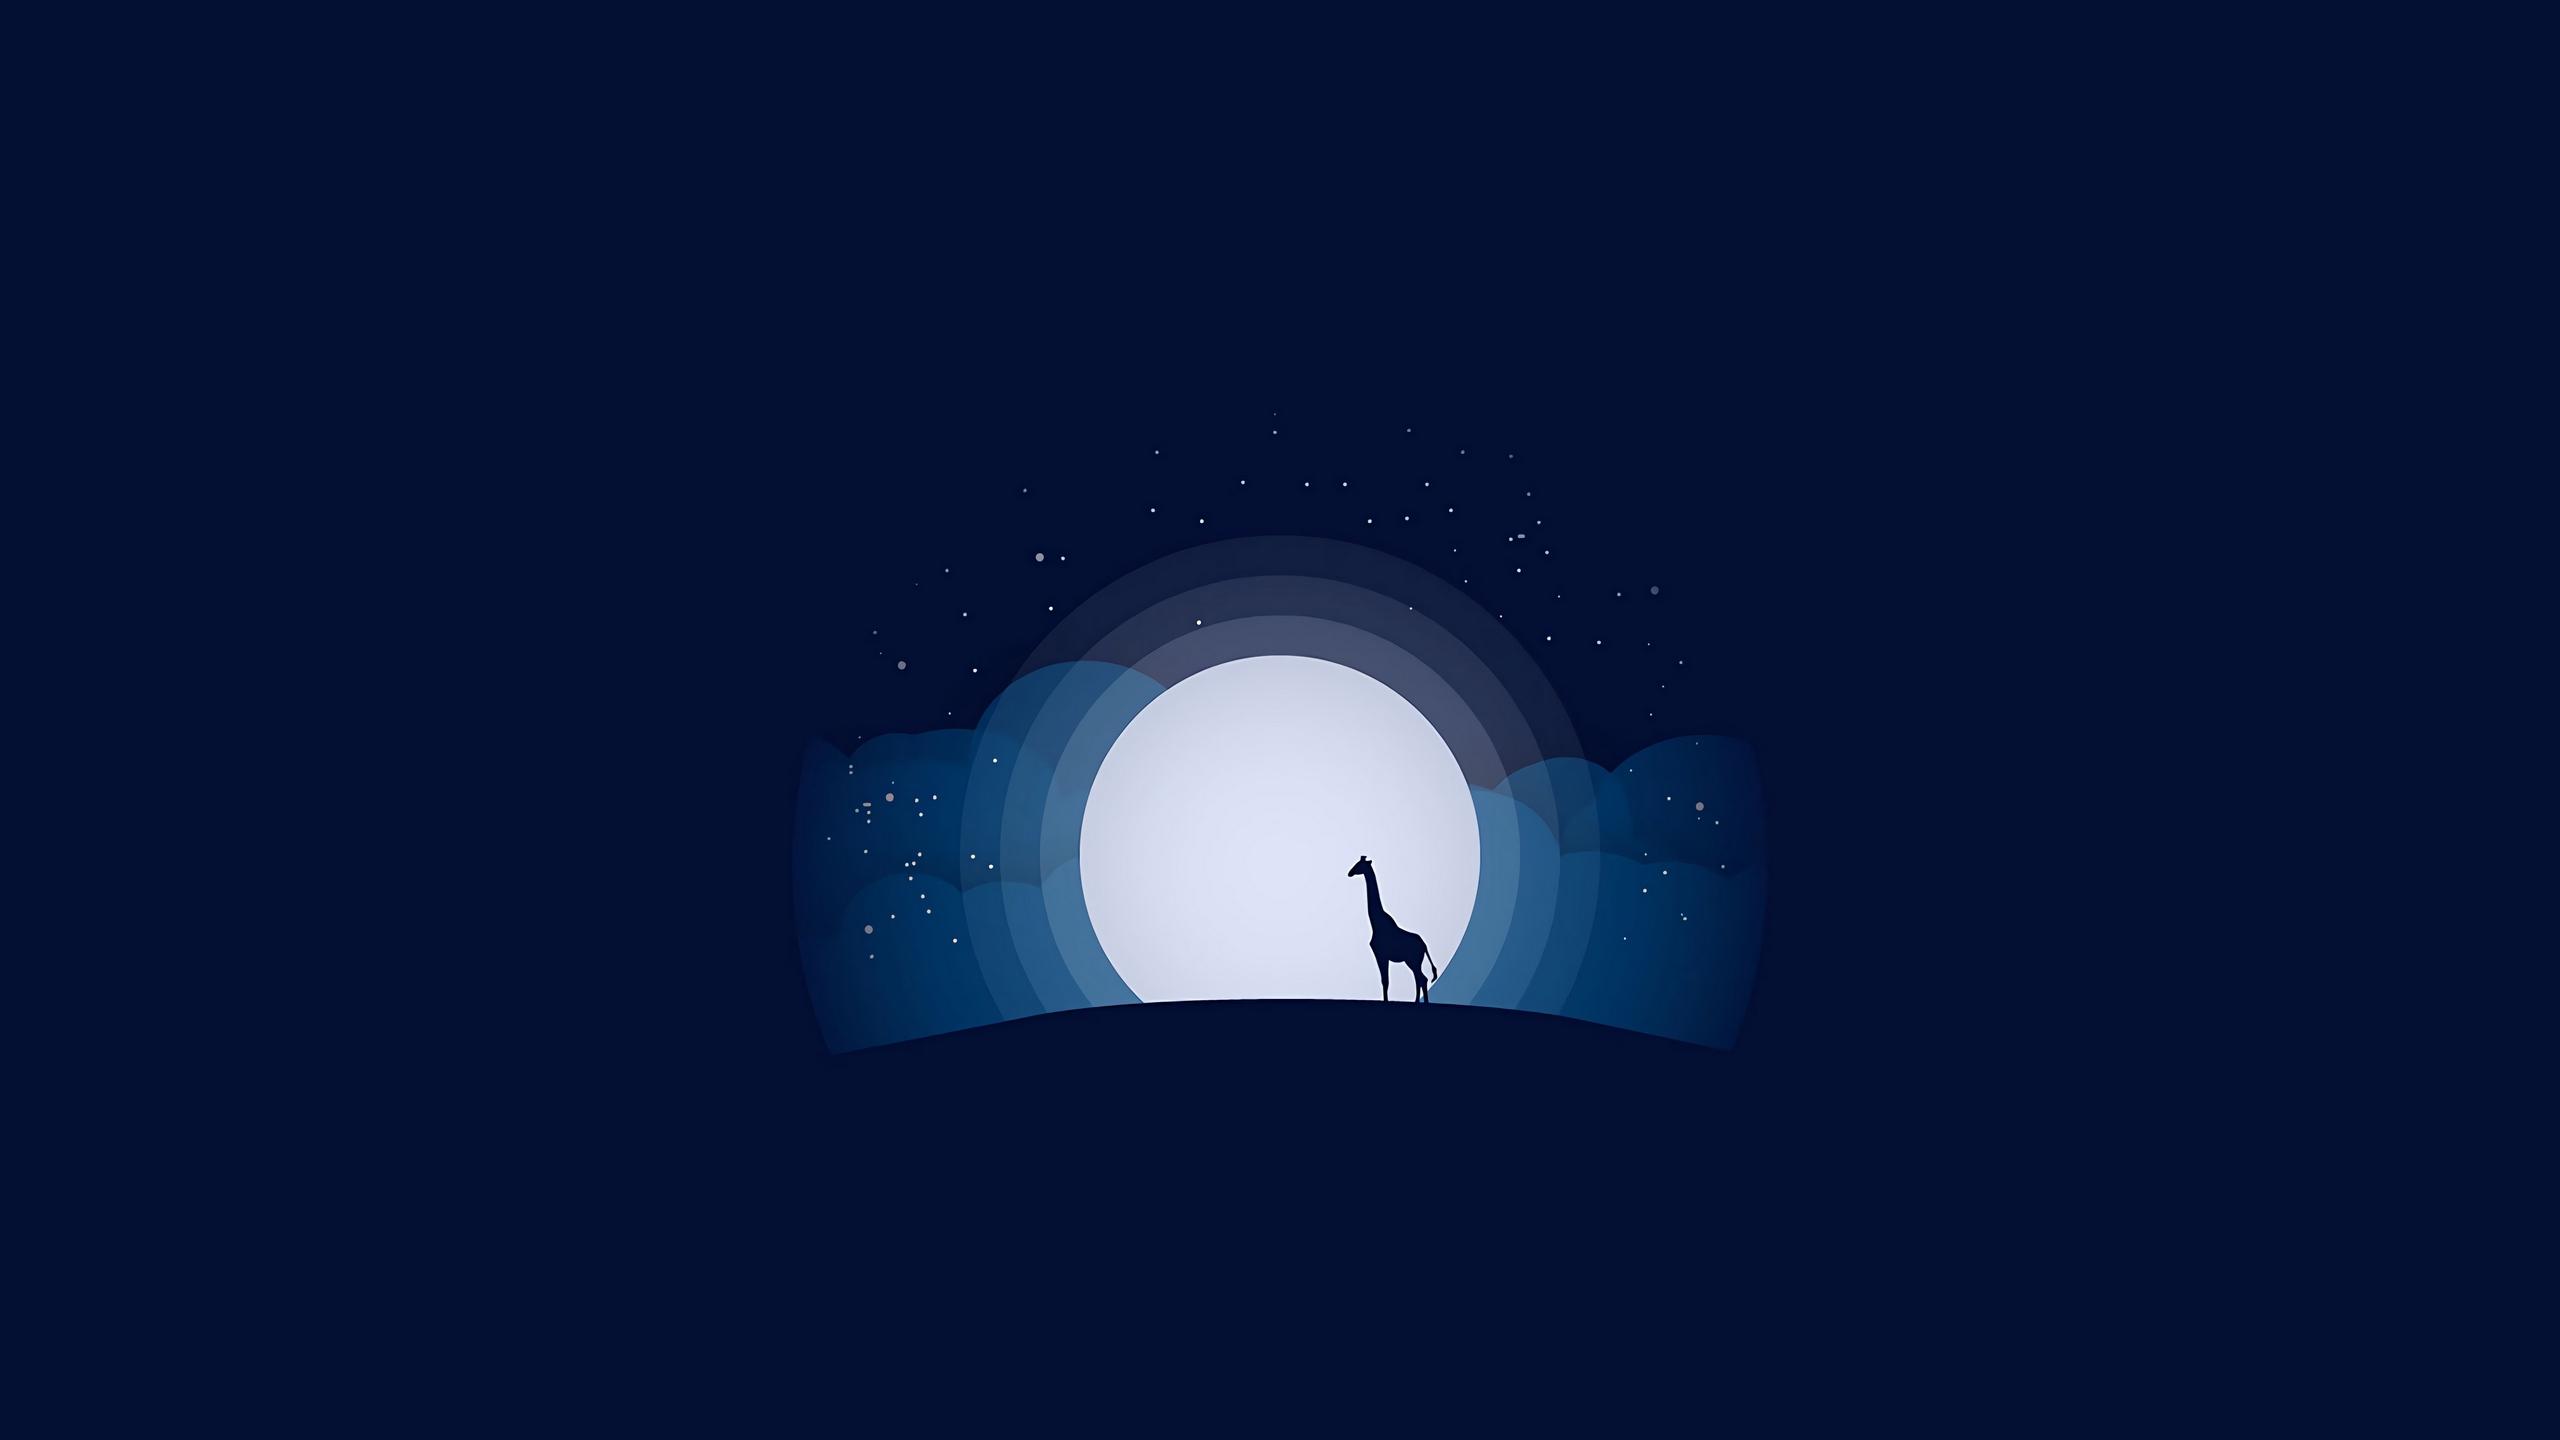 General 2560x1440 blue background simple background minimalism digital digital art artwork Moon moon rays moonlight night stars clouds giraffes hills vector art